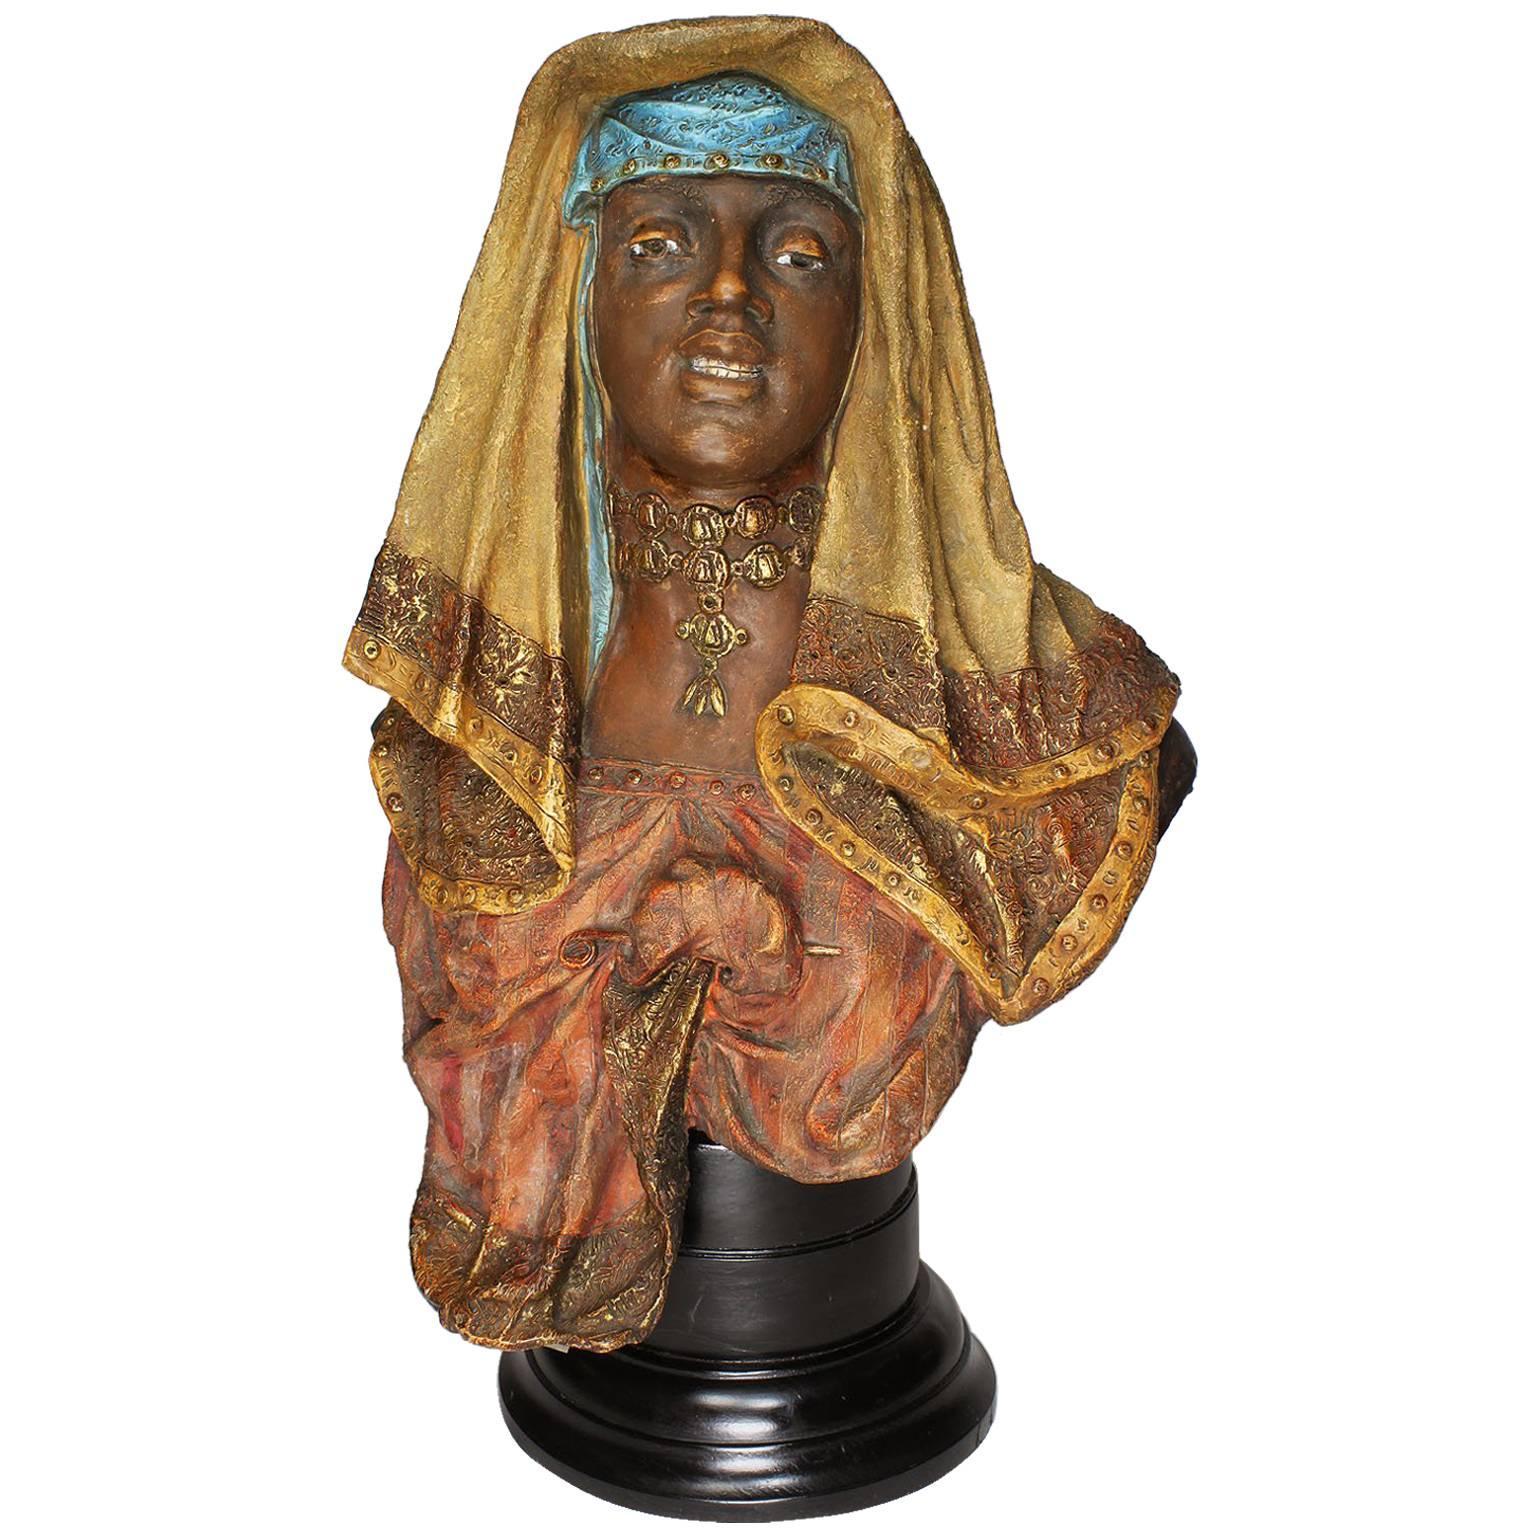 19th-20th Century Orientalist Terracotta Bust of Girl Attributed to Goldscheider